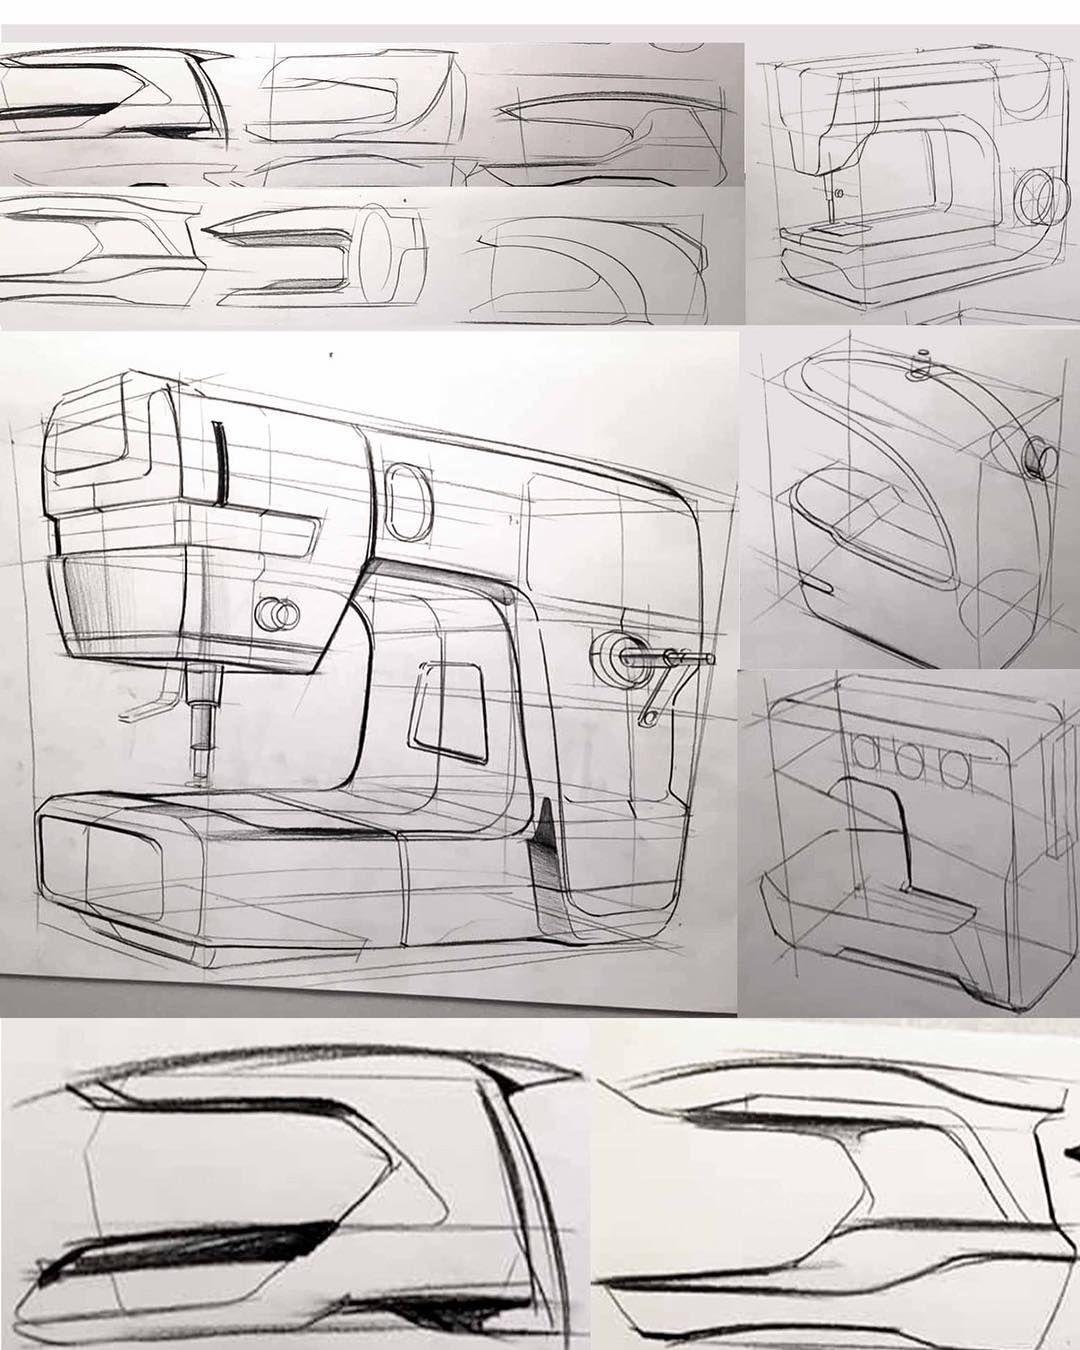 Design Industriel En 2020 Design Industriel Agence De Design Design